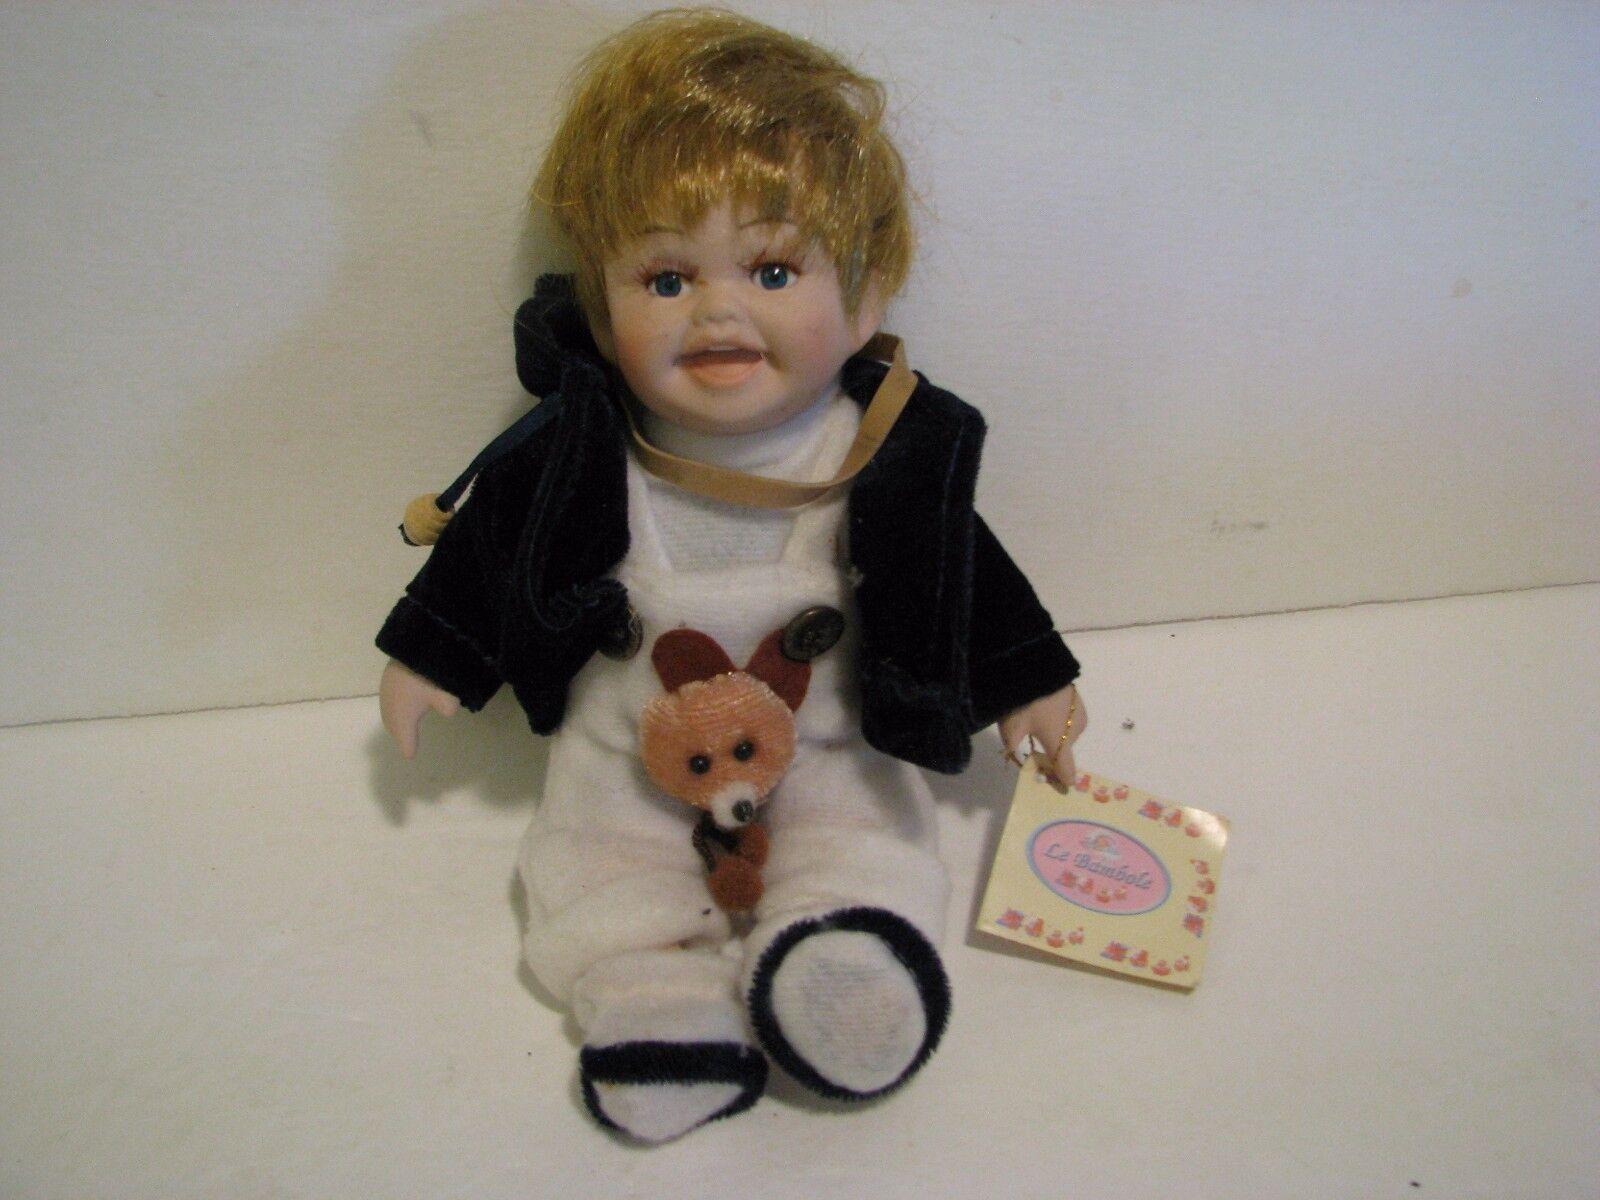 Vintage Le Bambole  - Porcelain Doll - GESCO KID  - Handmade -